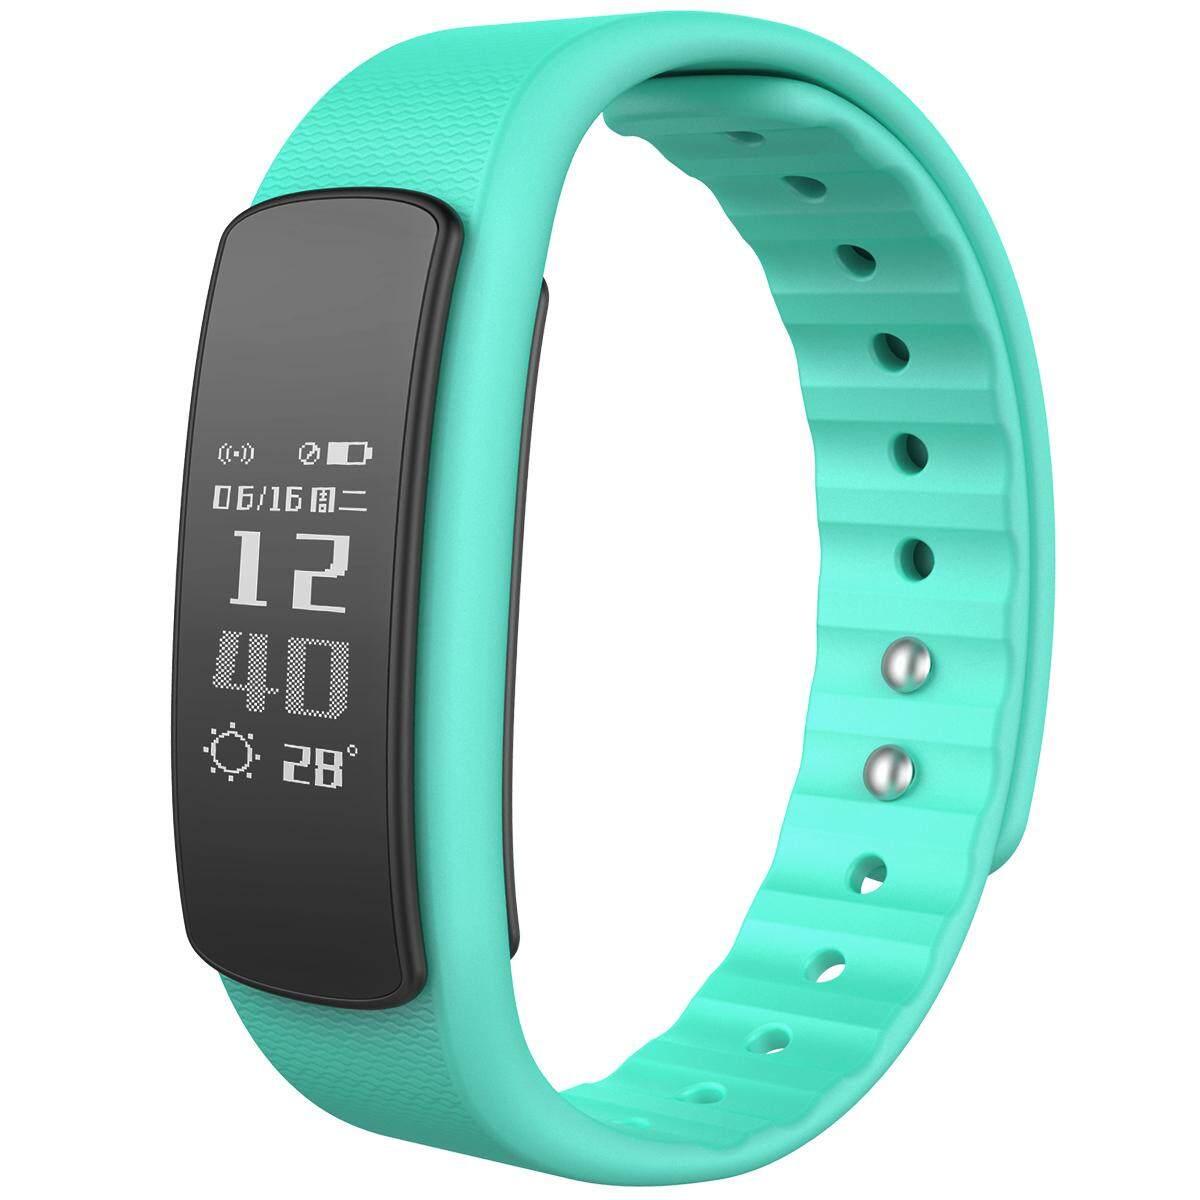 iwownfit I6HR TPU + TPE Bluetooth v4.0 IP67 Smart Wristband - Green - intl